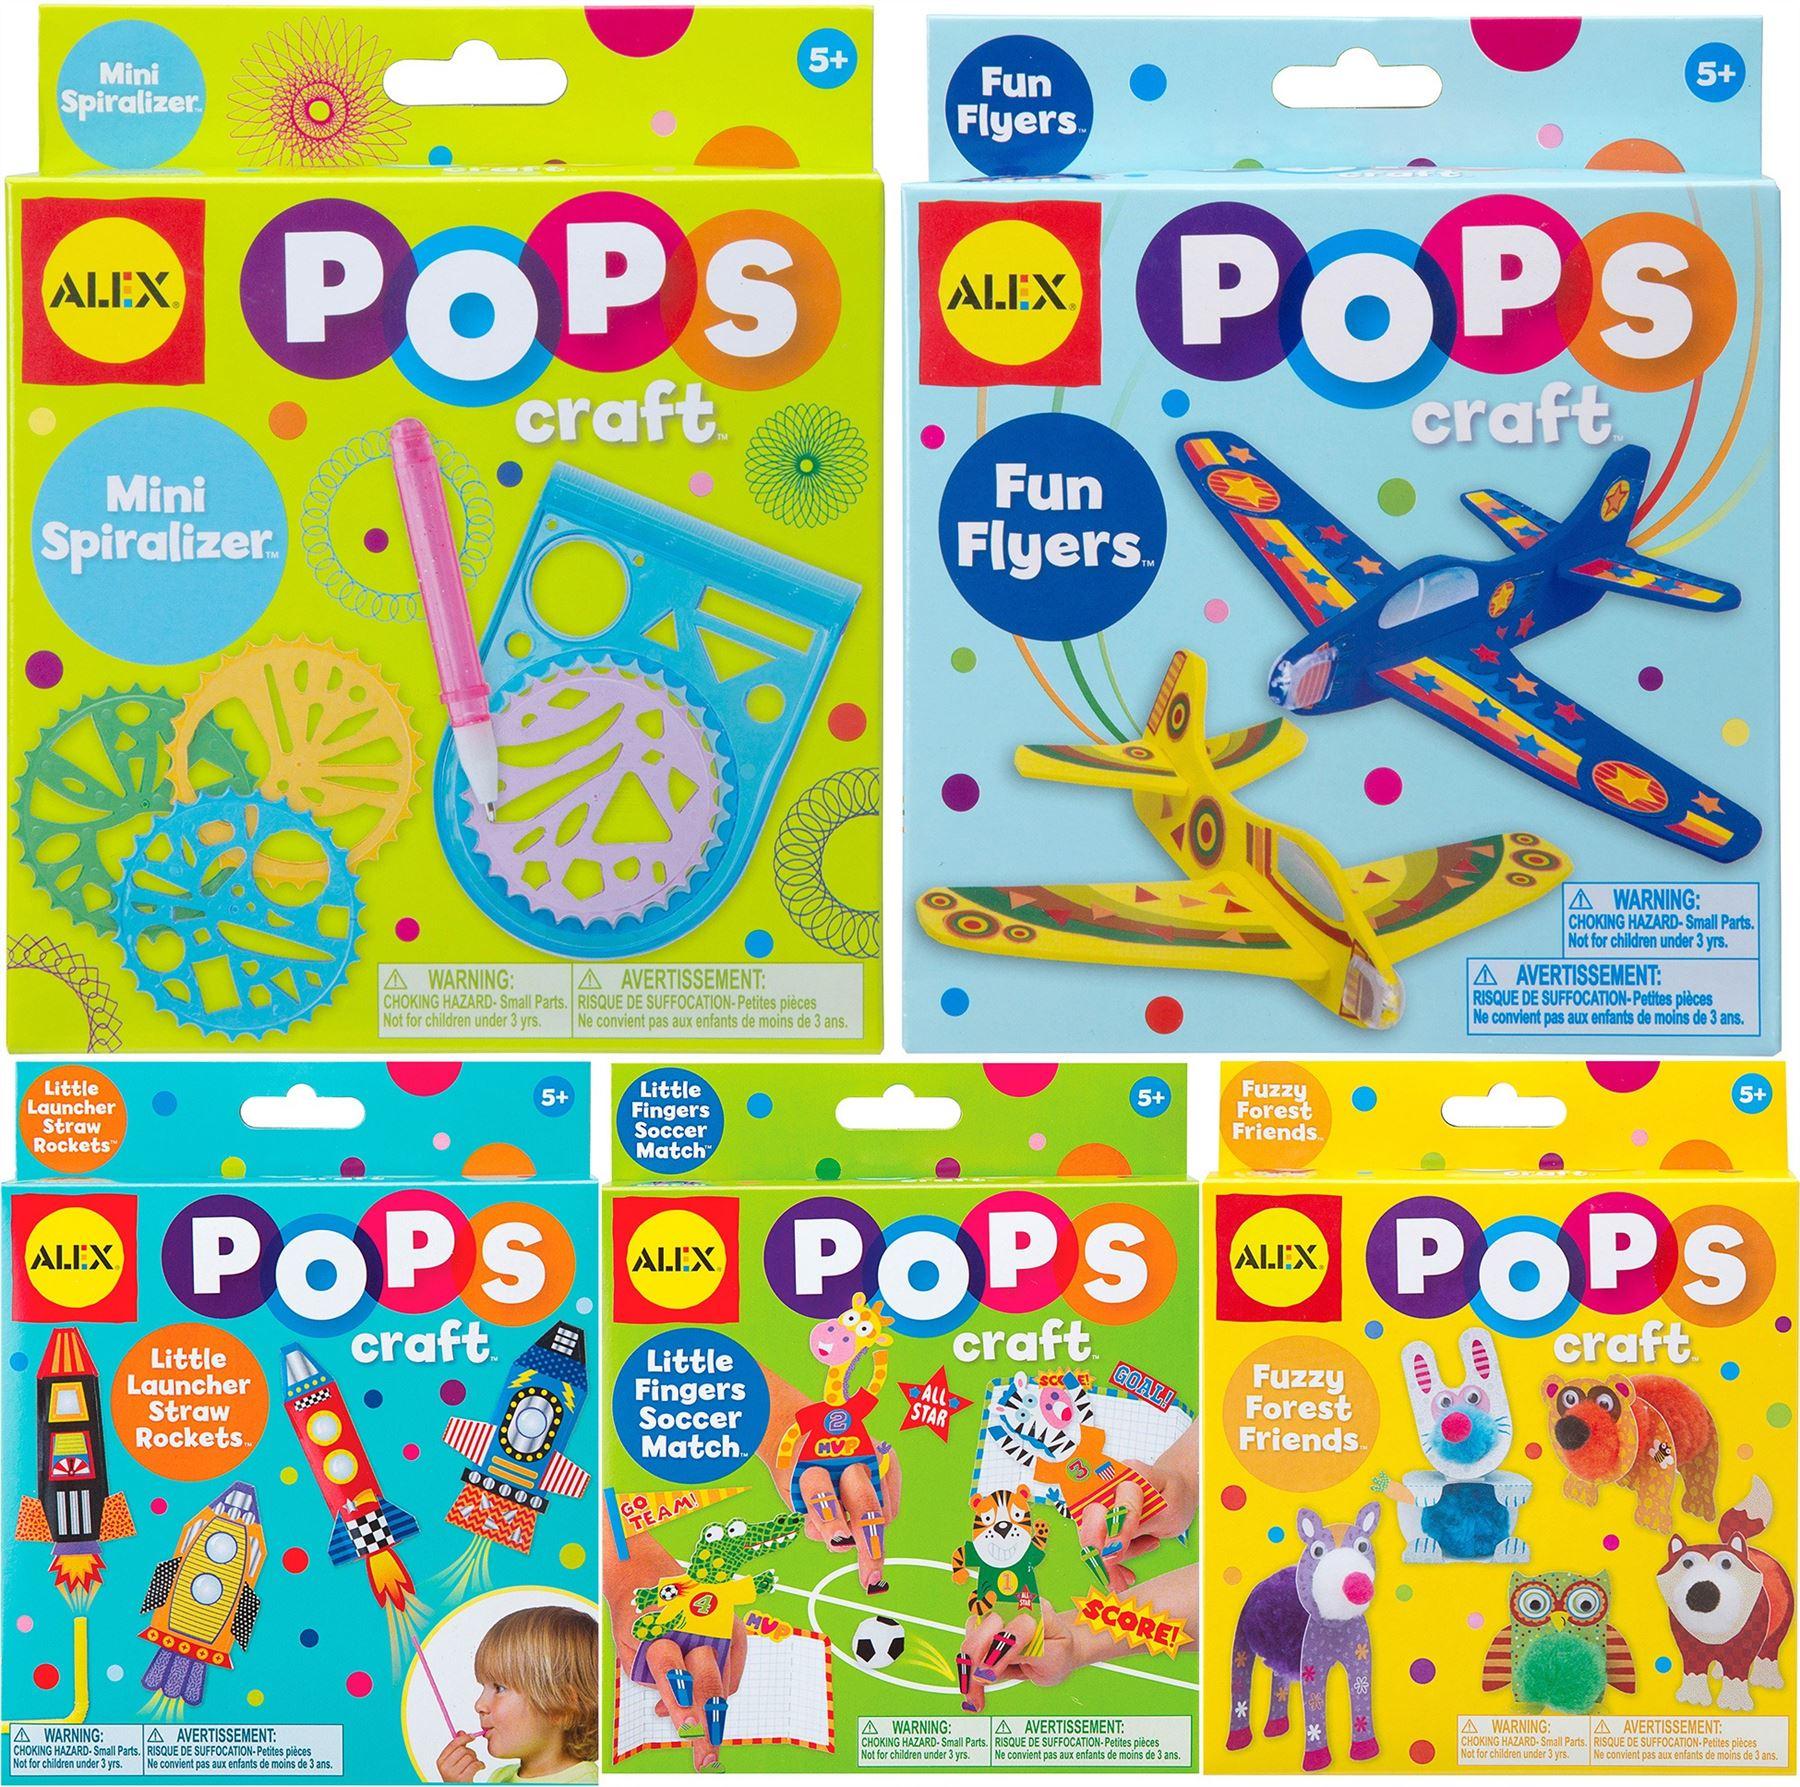 Alex Pops Bastelset Kreativ Kinder Basteln Spielzeug 5 Jahre Neu